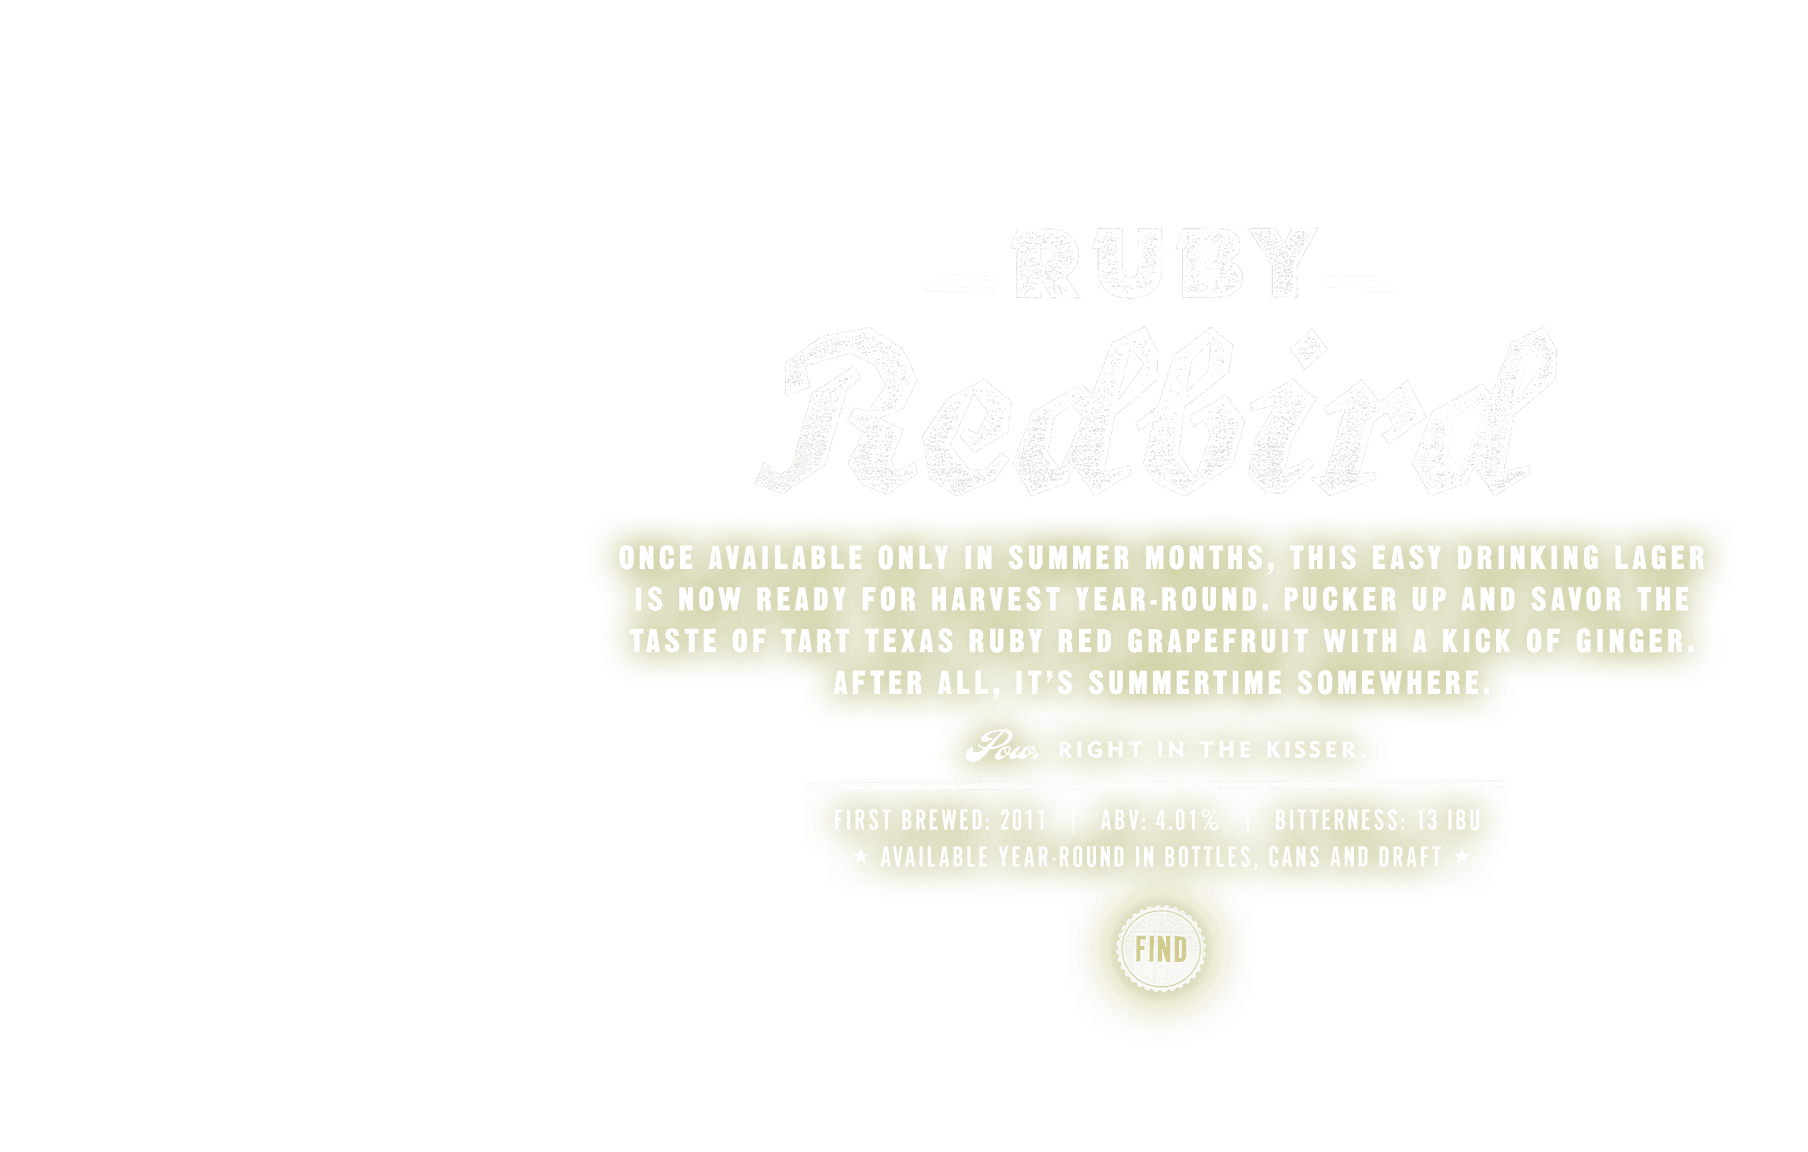 Kptxbhvqucnkydxdonmb shi 14110 rubyredbird desktop type only